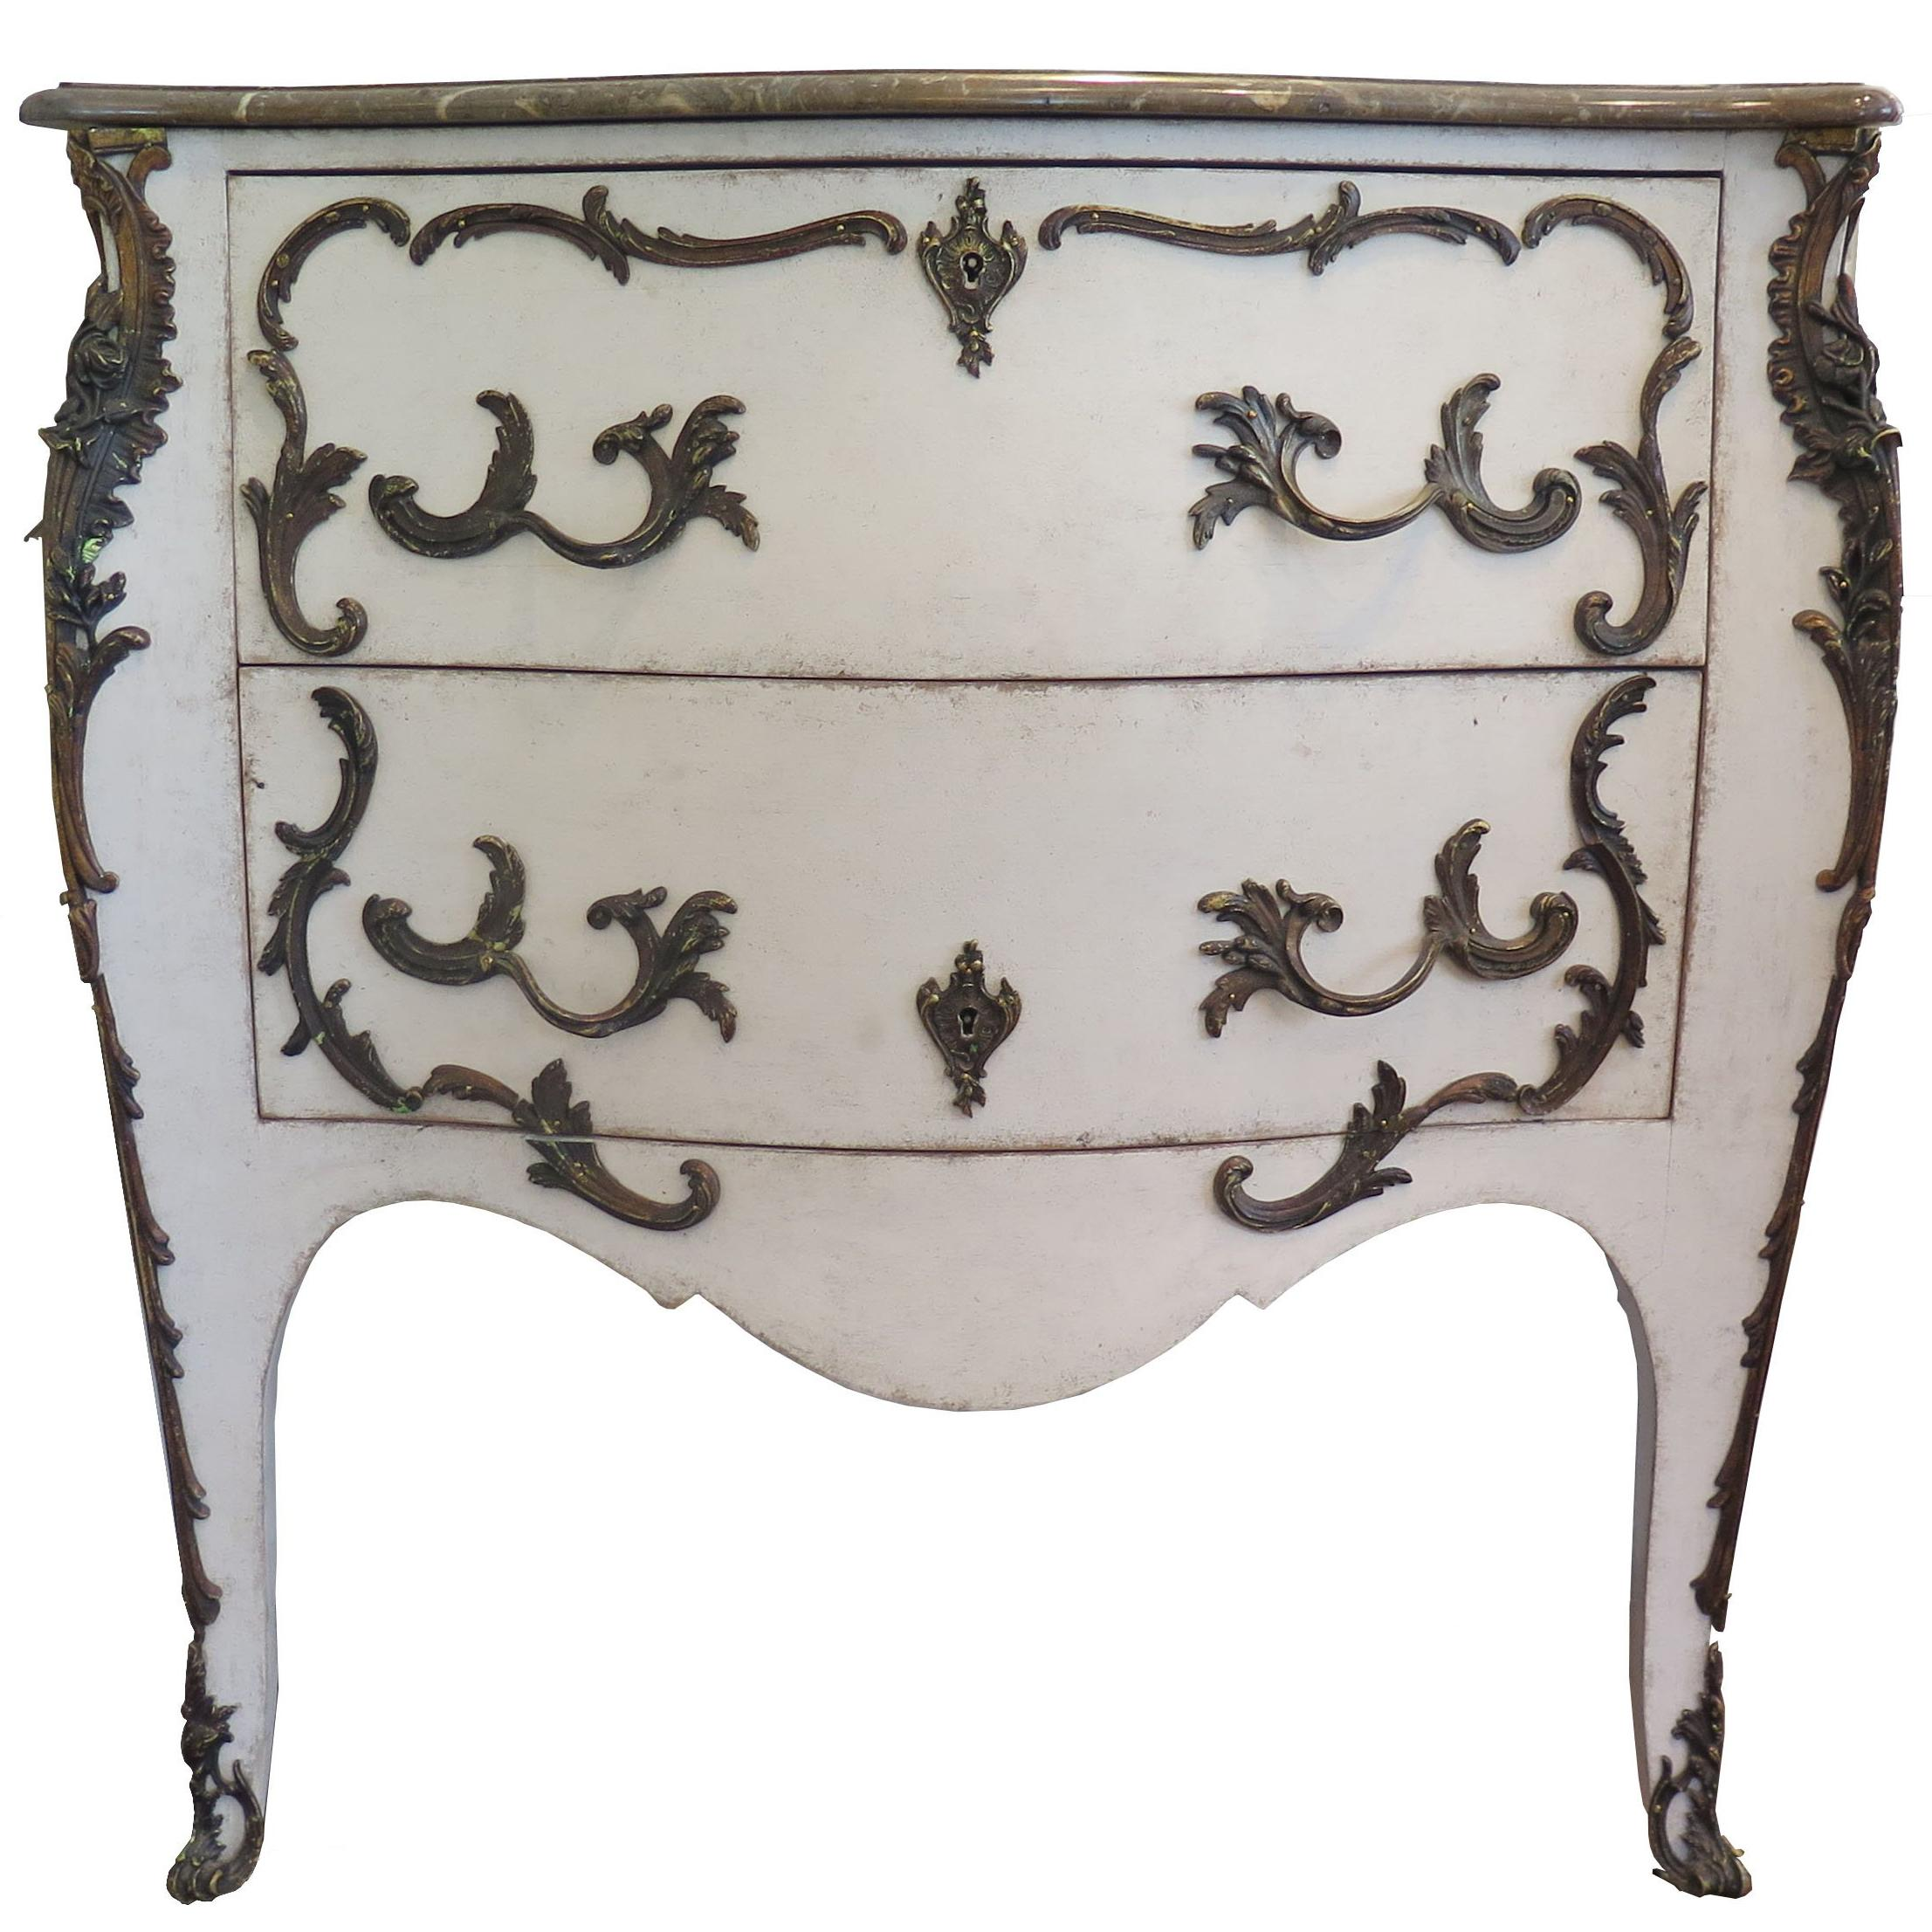 19th Century Swedish Painted Rococo Commode